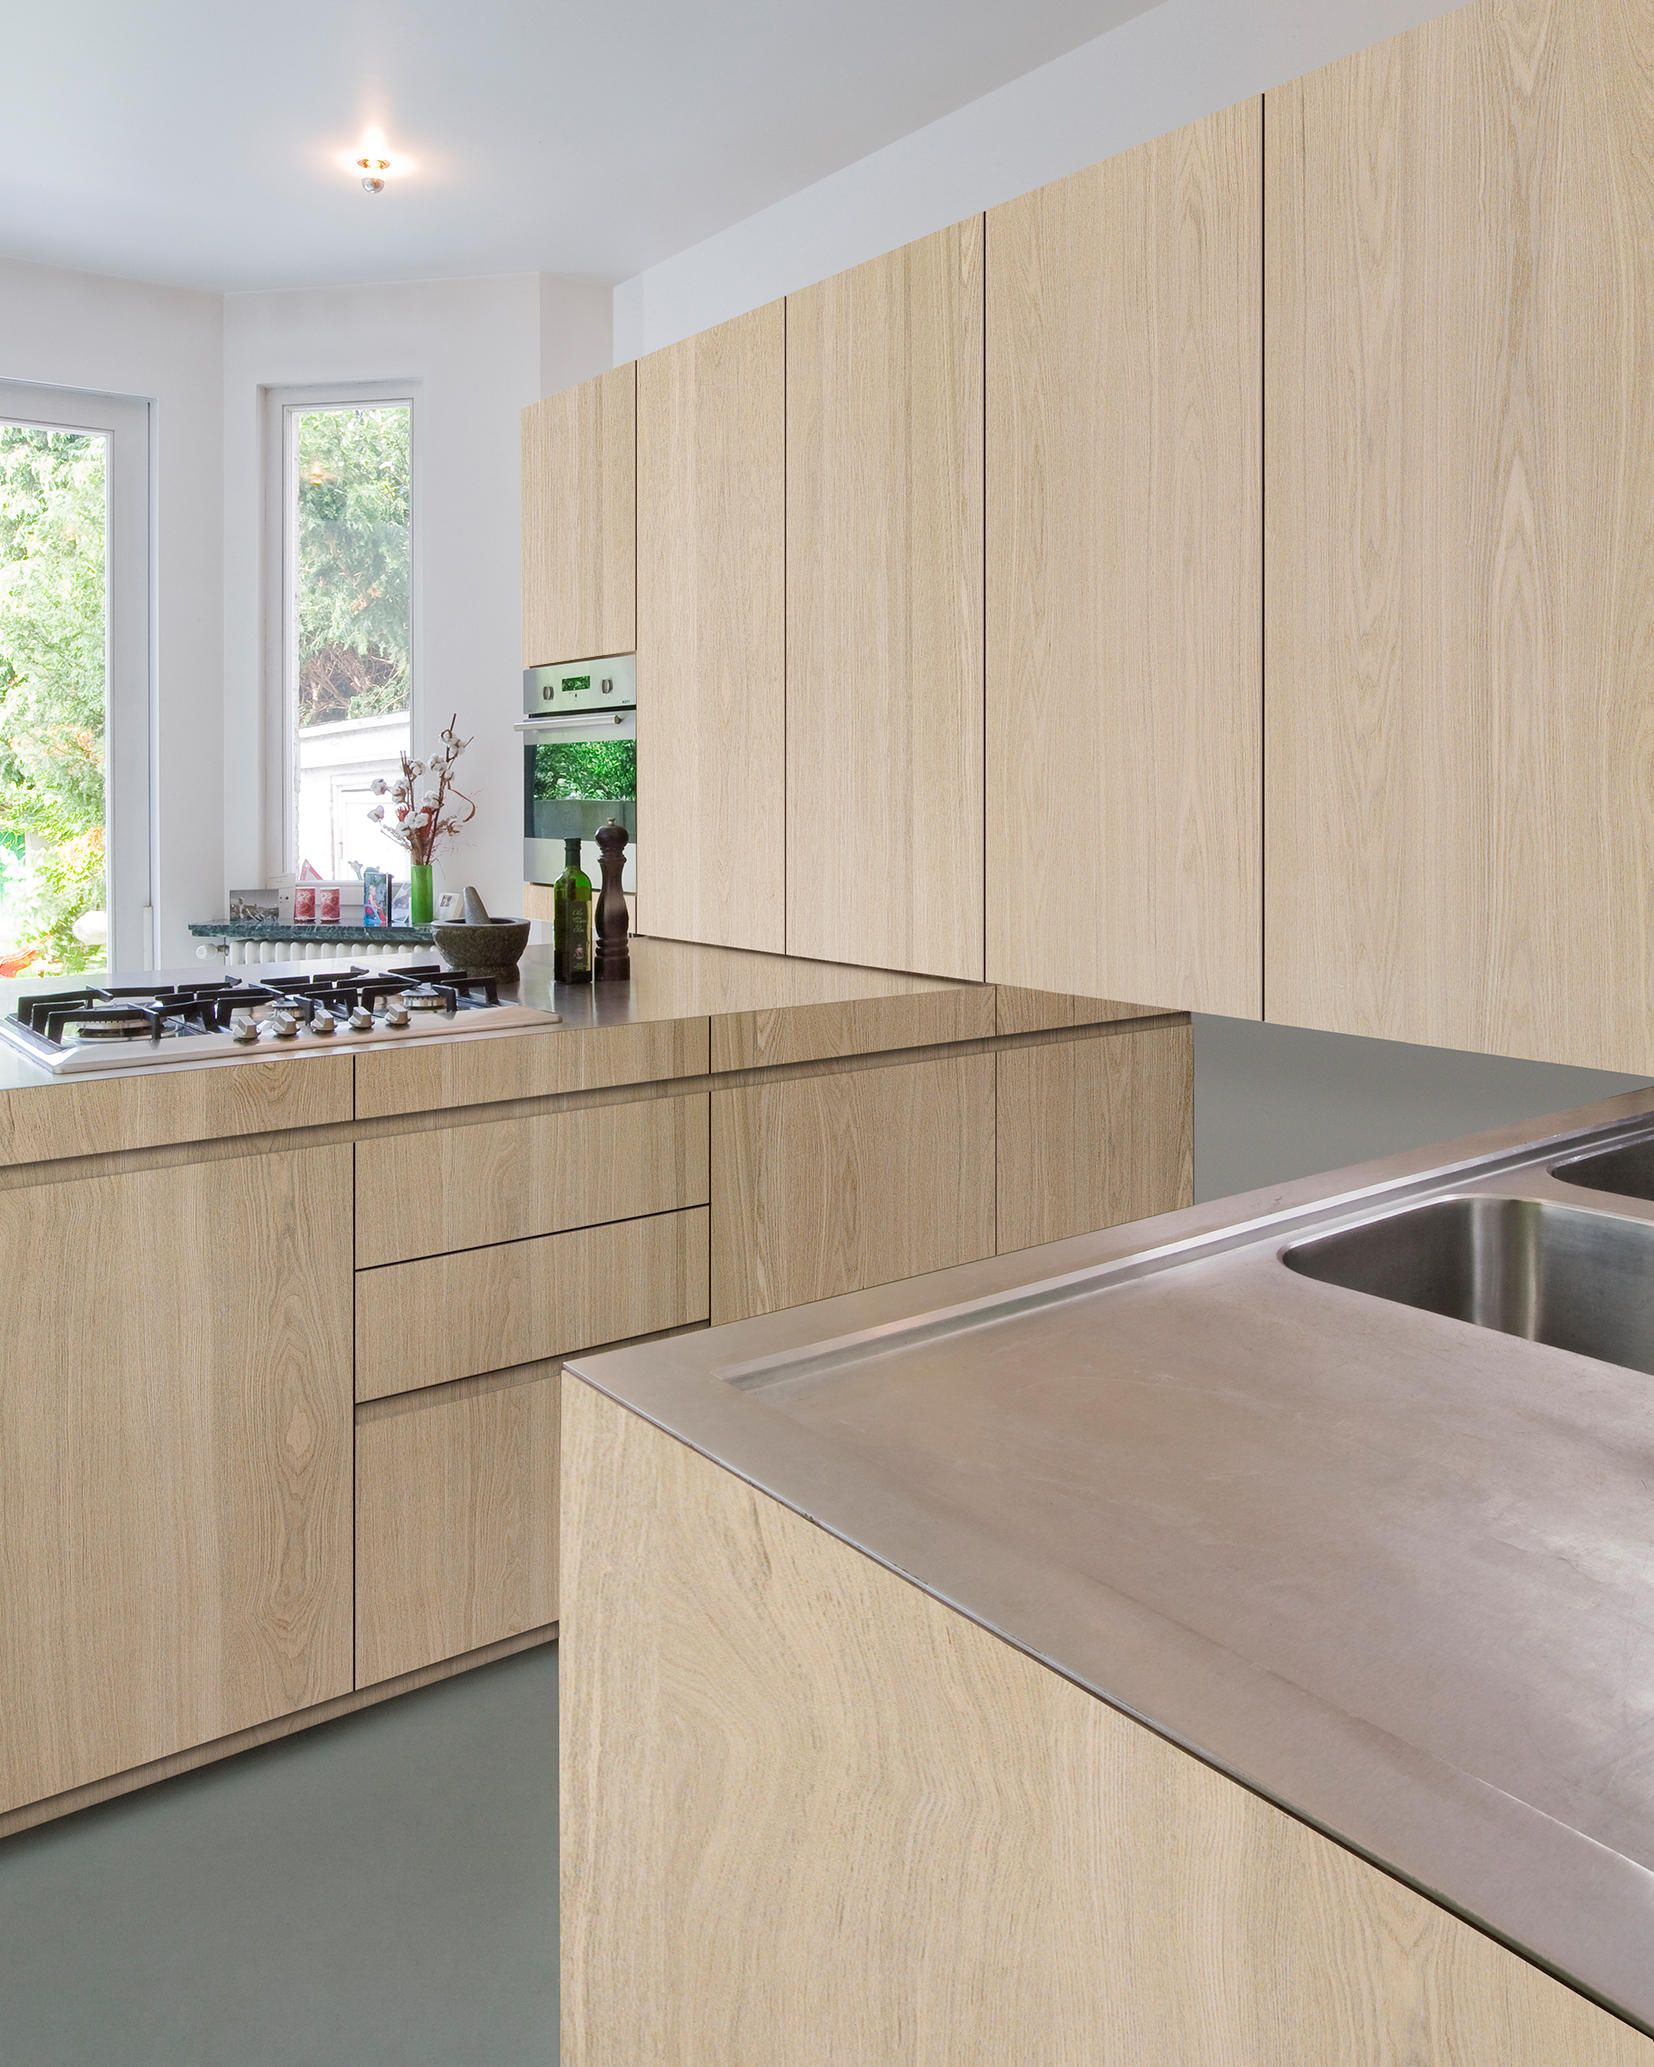 Shinnoki Sand Ash Veneers By Decospan Architonic White Oak Kitchen Kitchen Interior Wood Interior Design